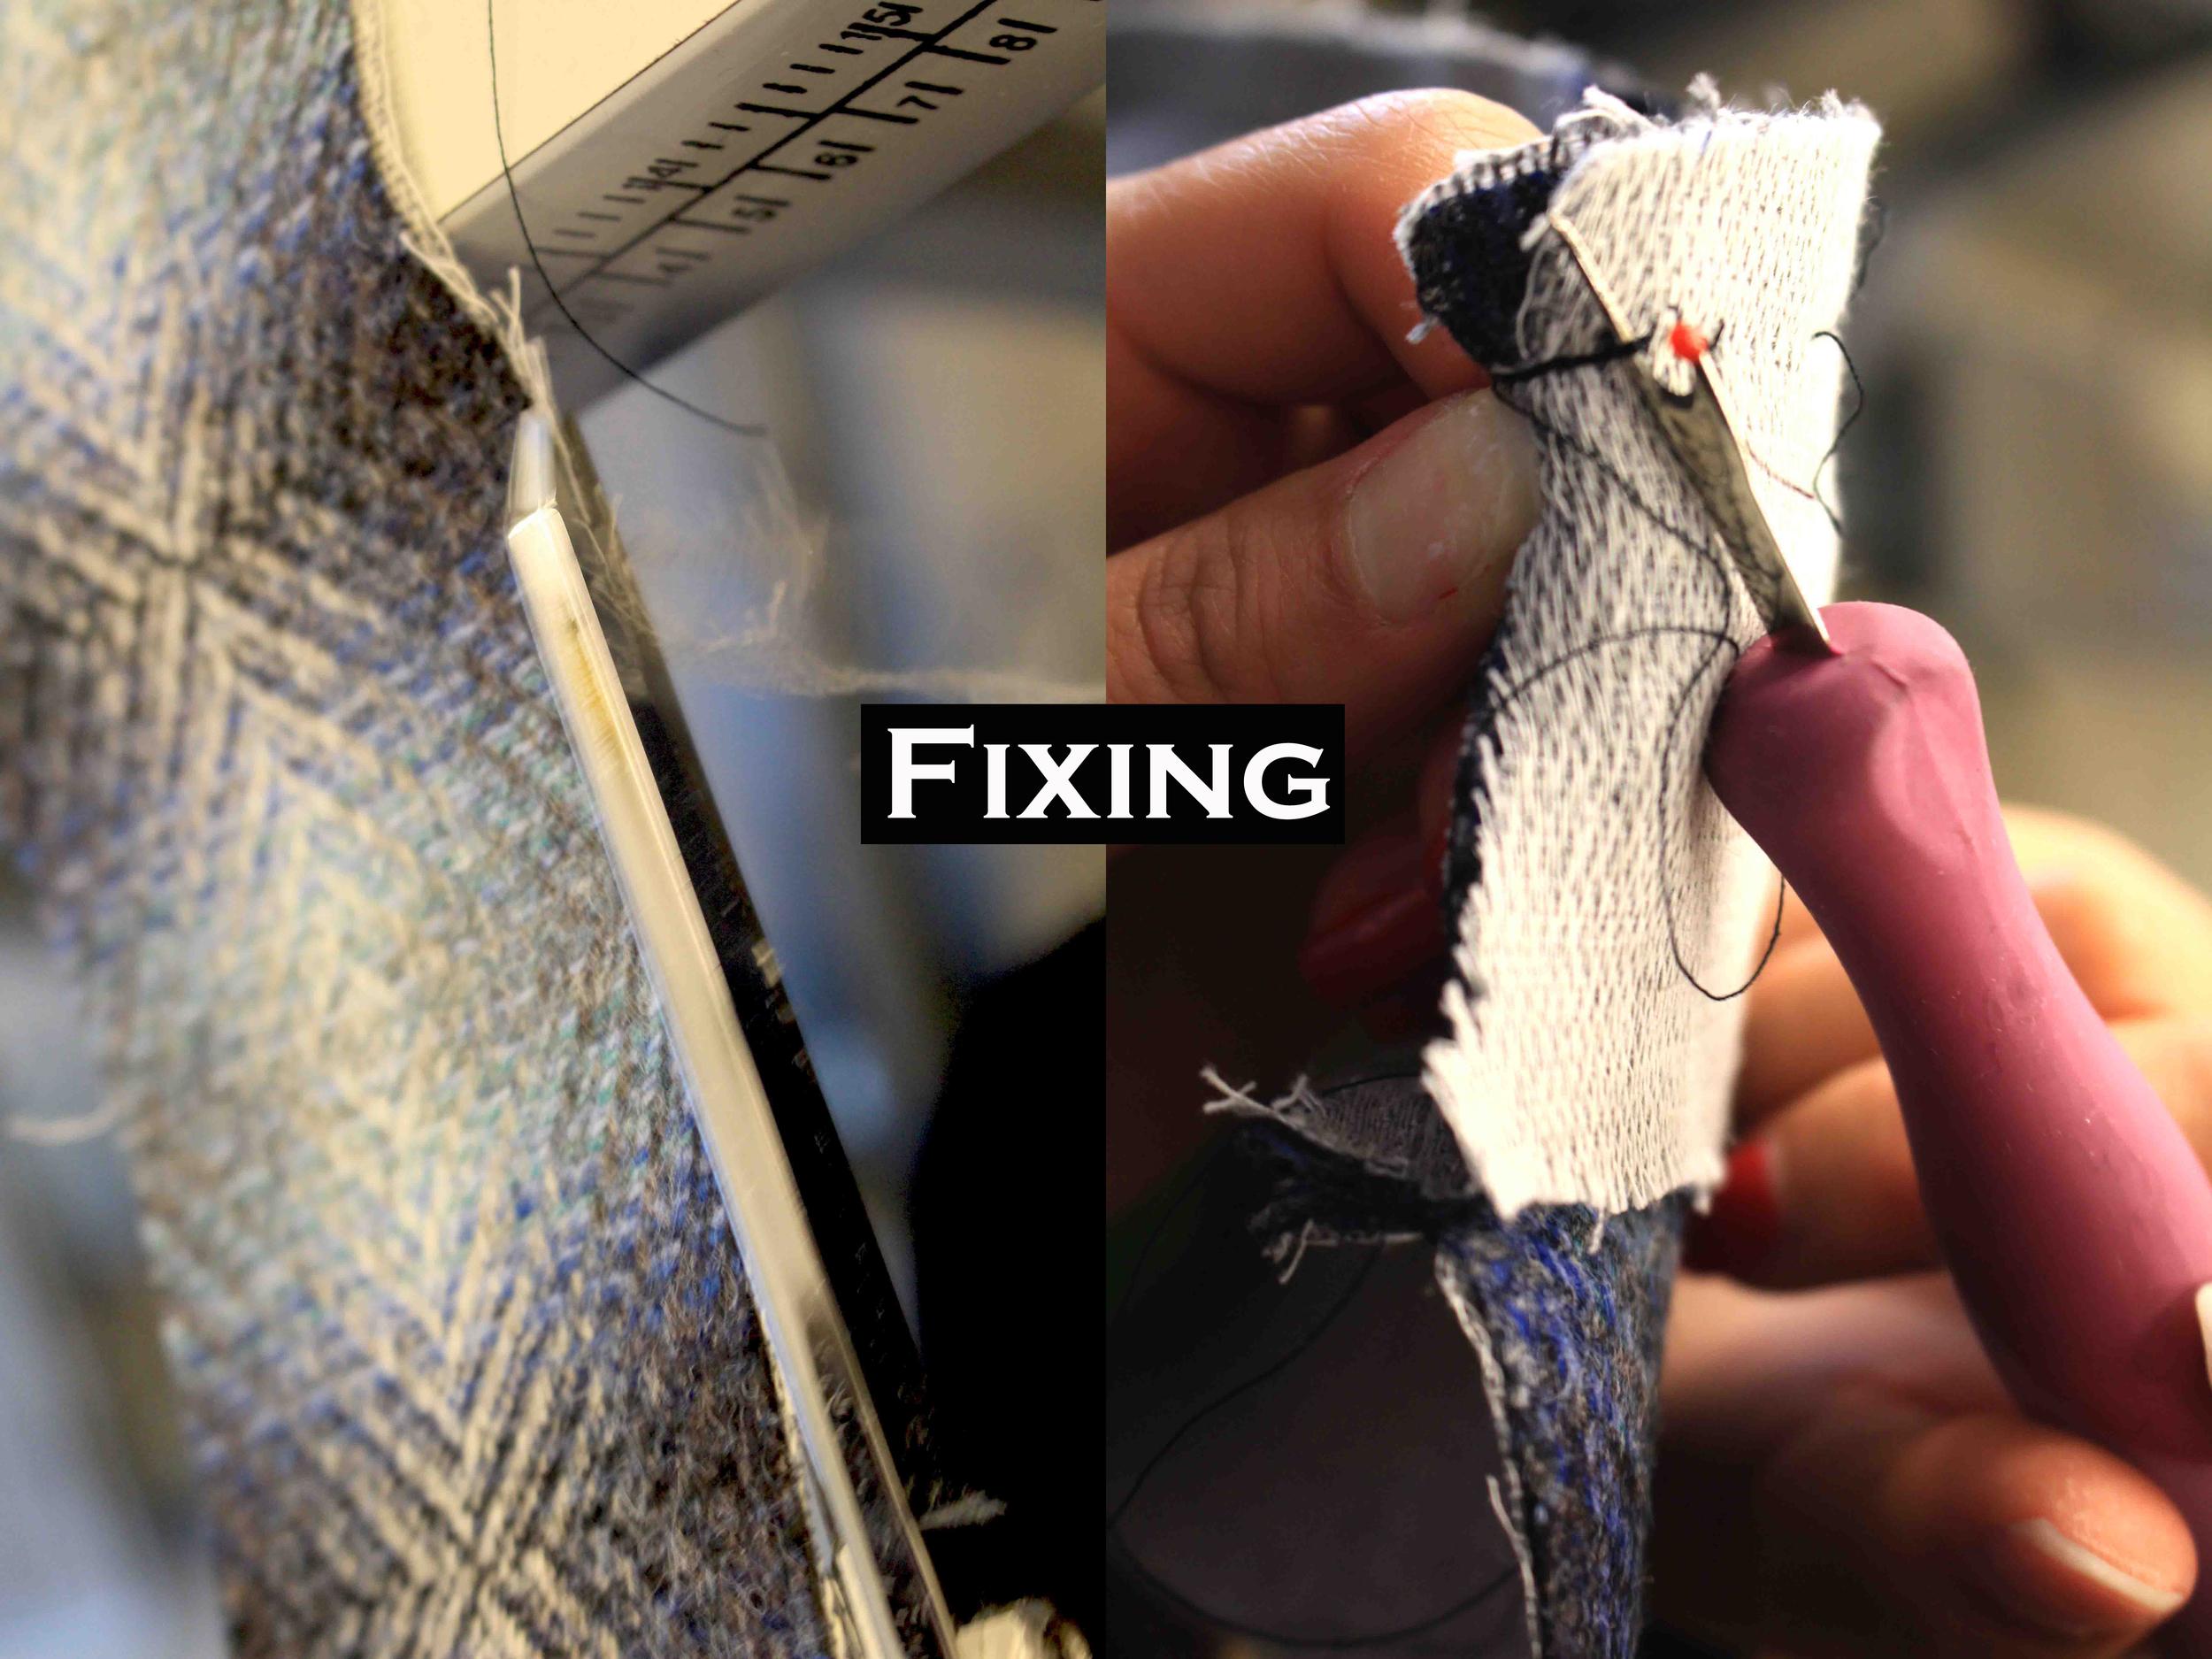 Fixing copy.jpg